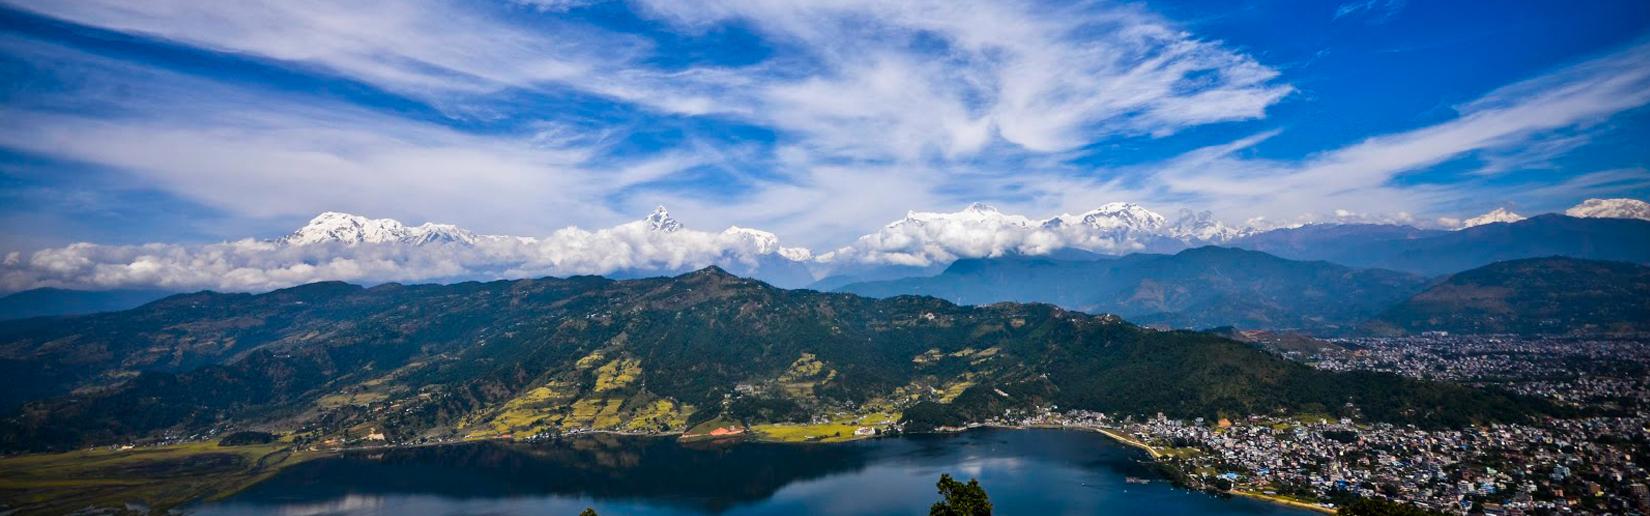 Family Holidays, Pokhara, Nepal